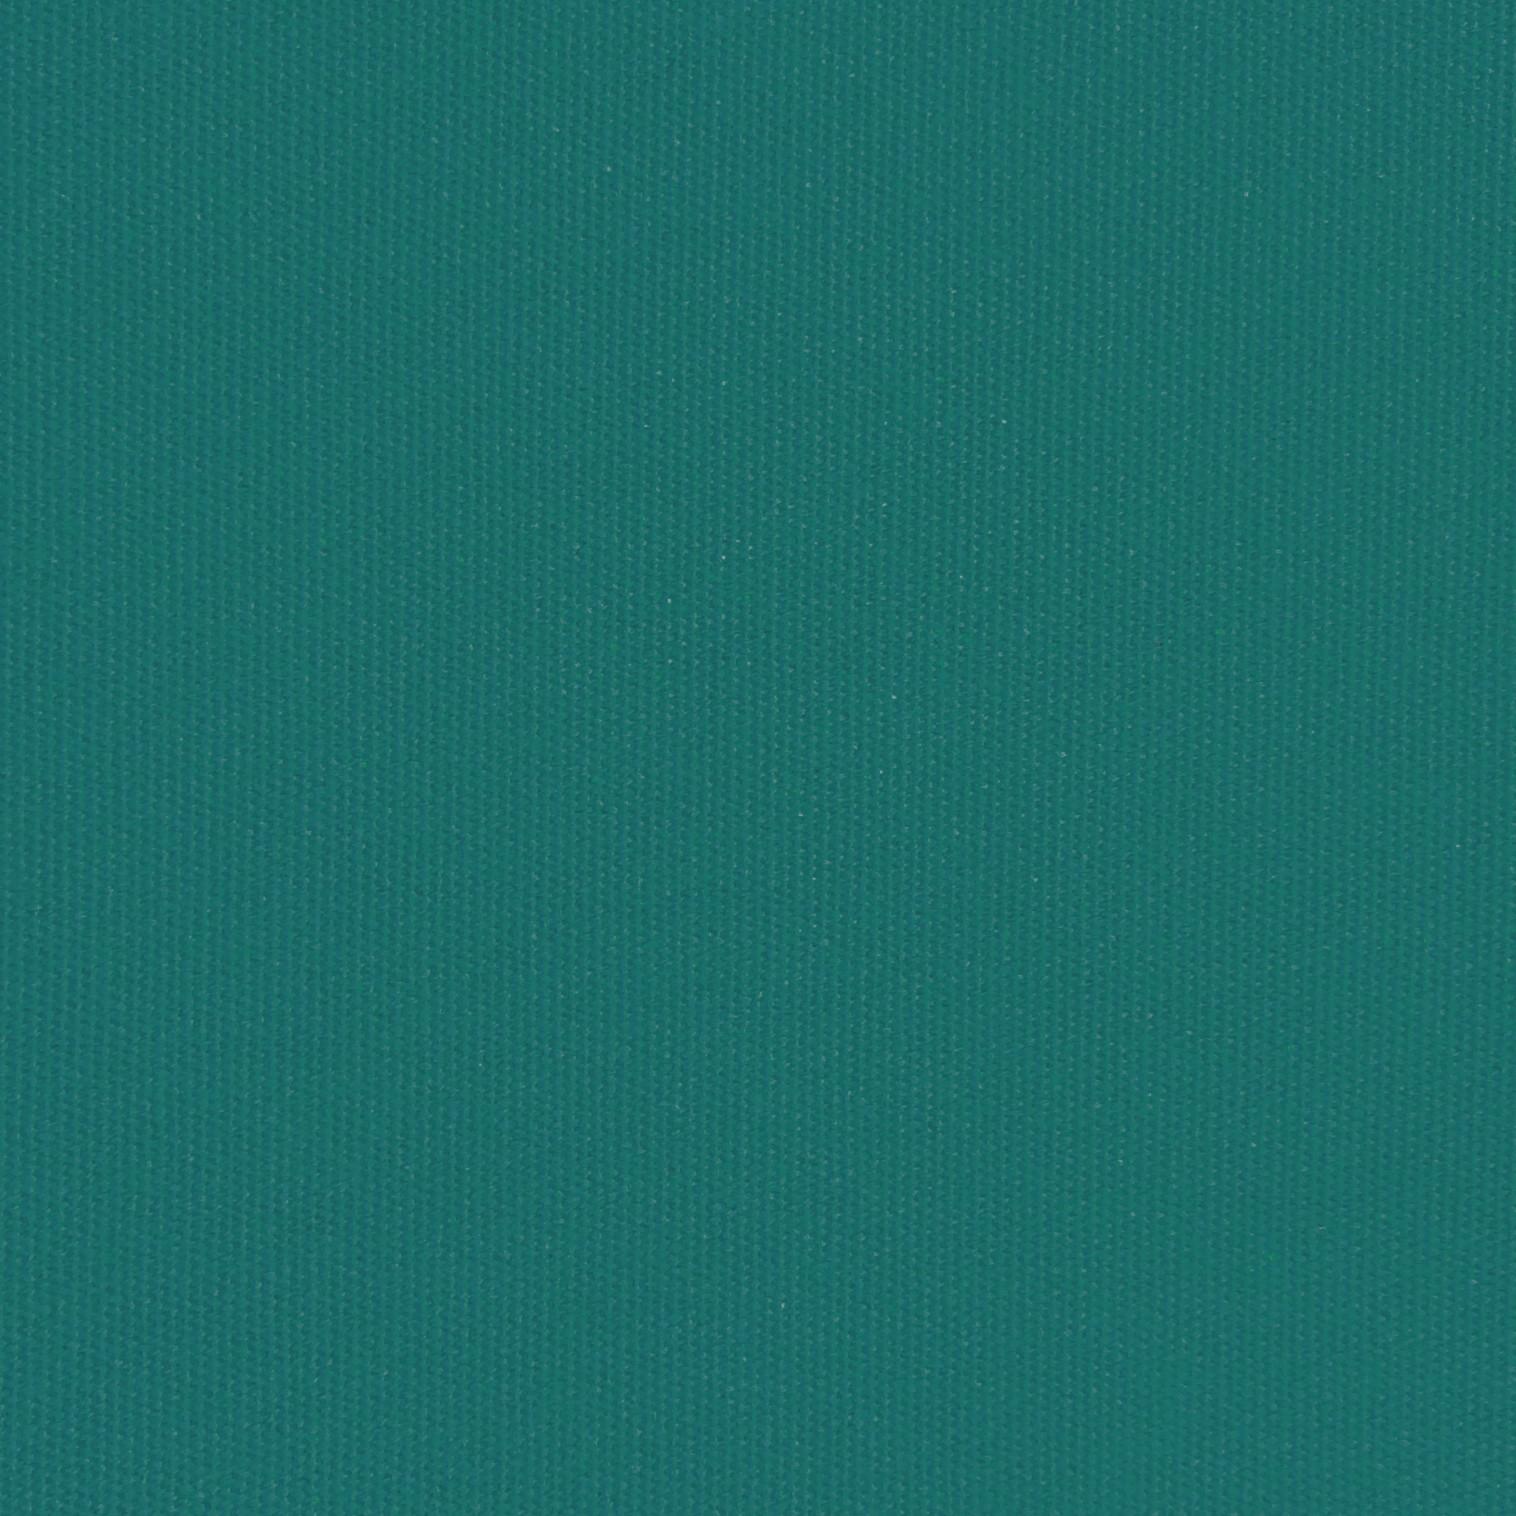 Azul verdoso